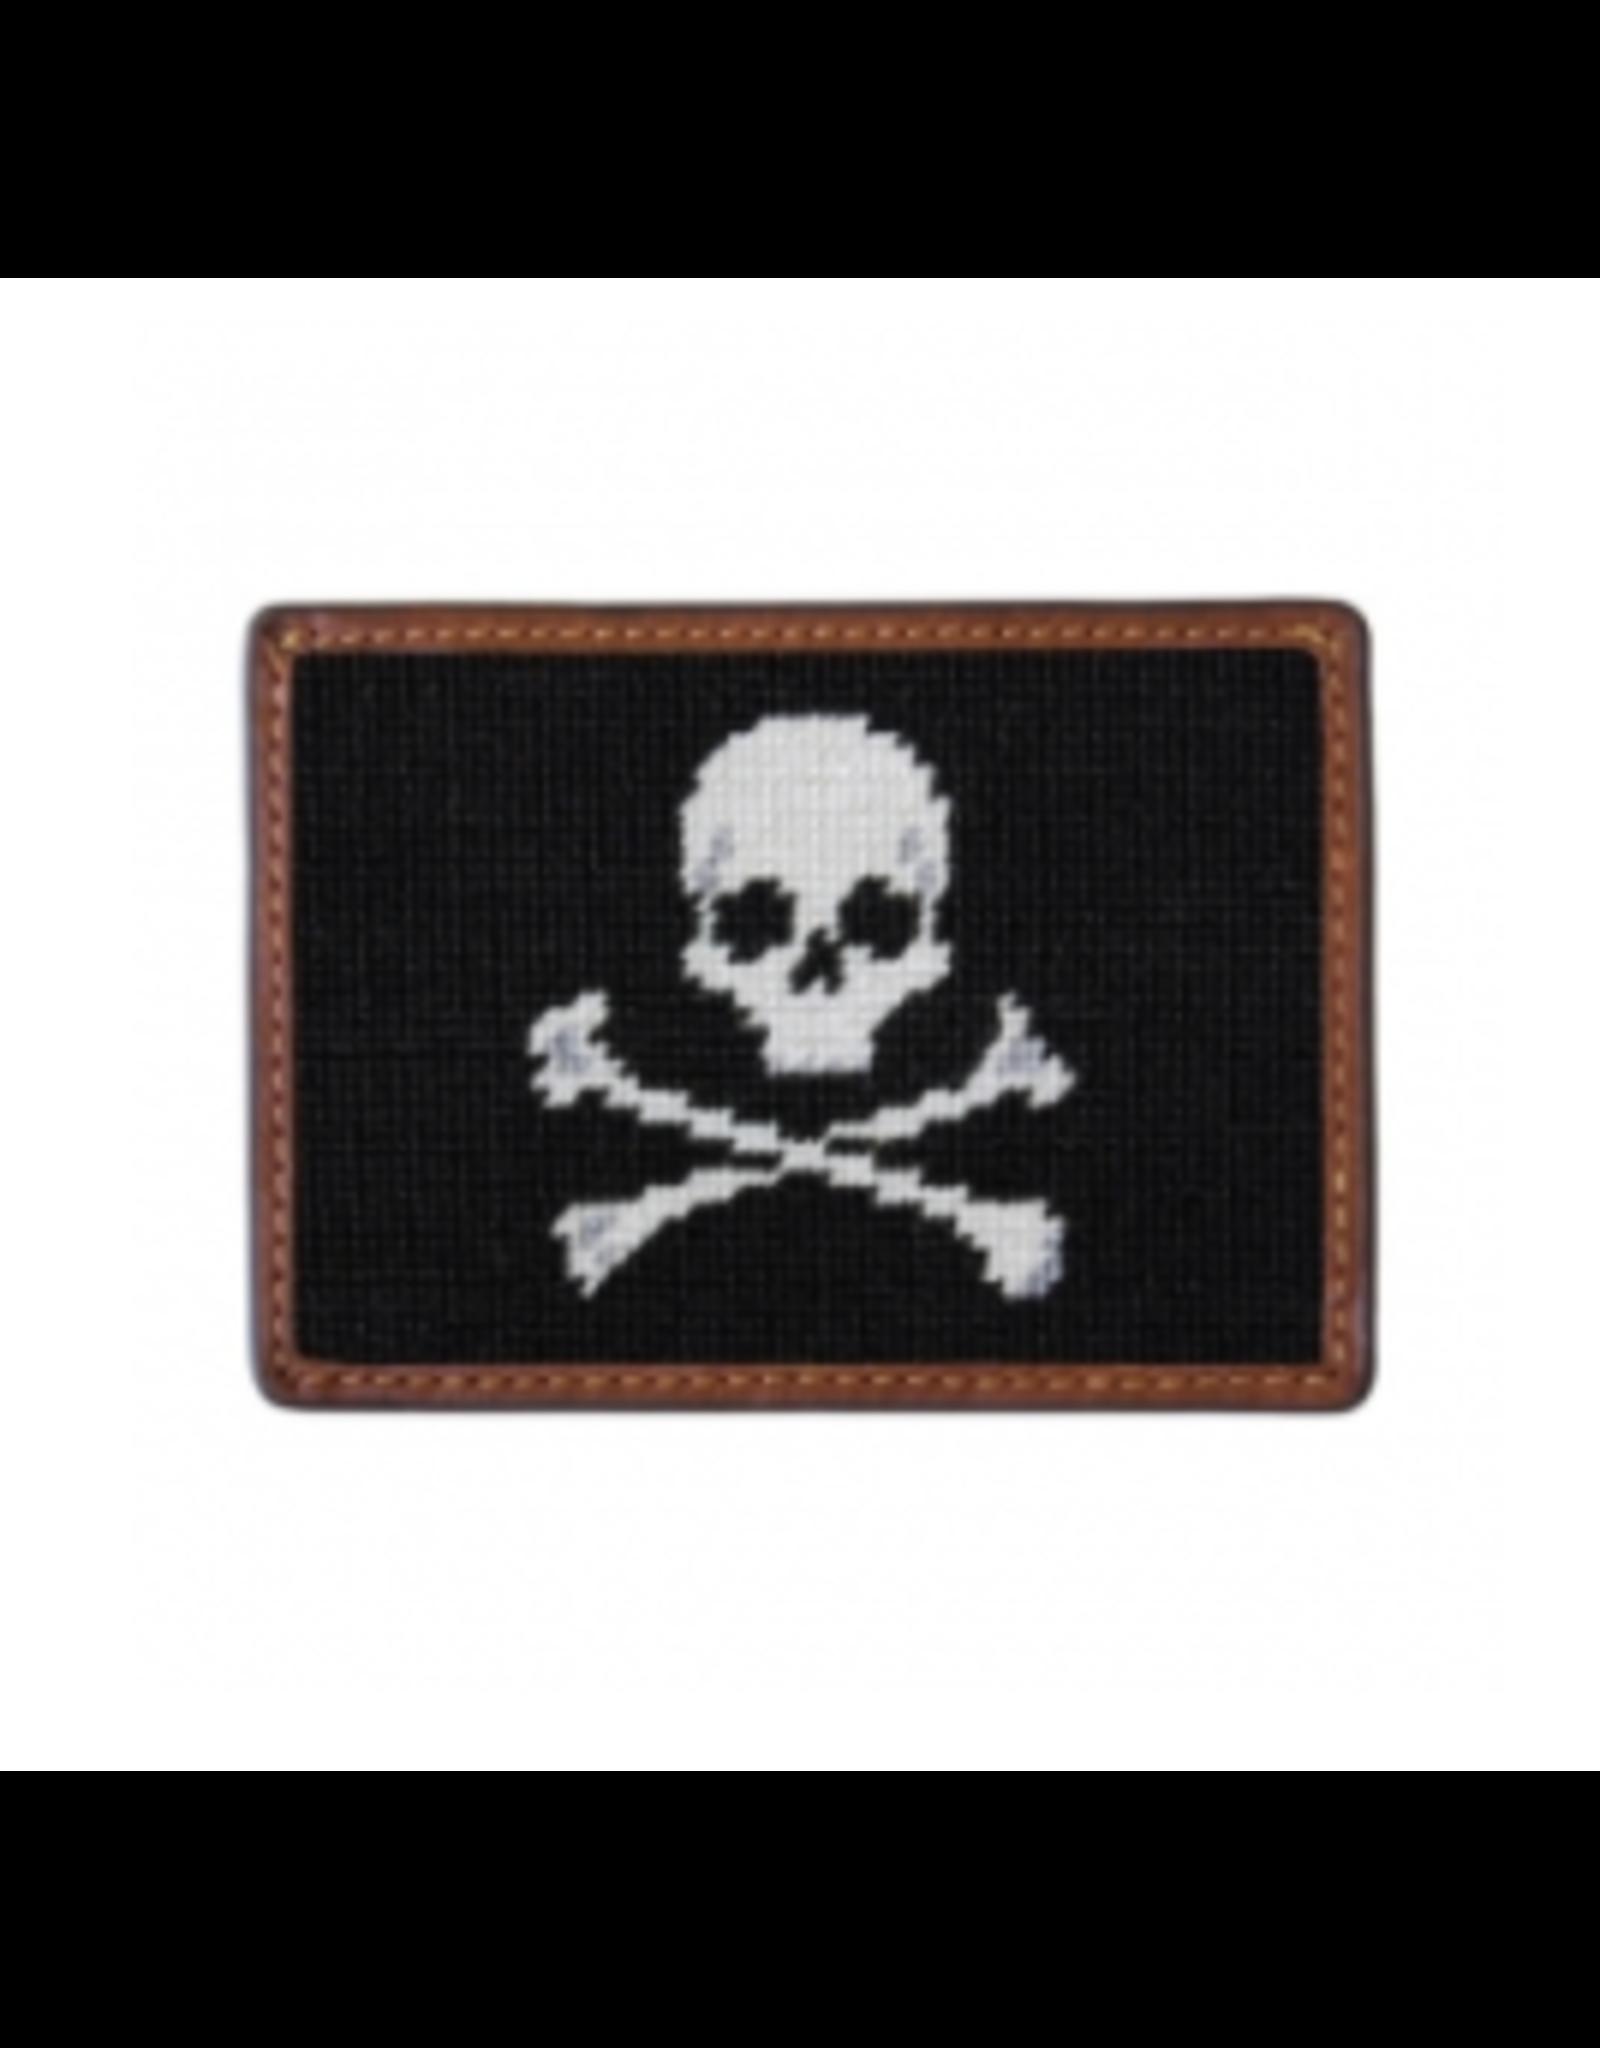 Smathers & Branson S&B Needlepoint Card Wallet, Jolly Roger (black)